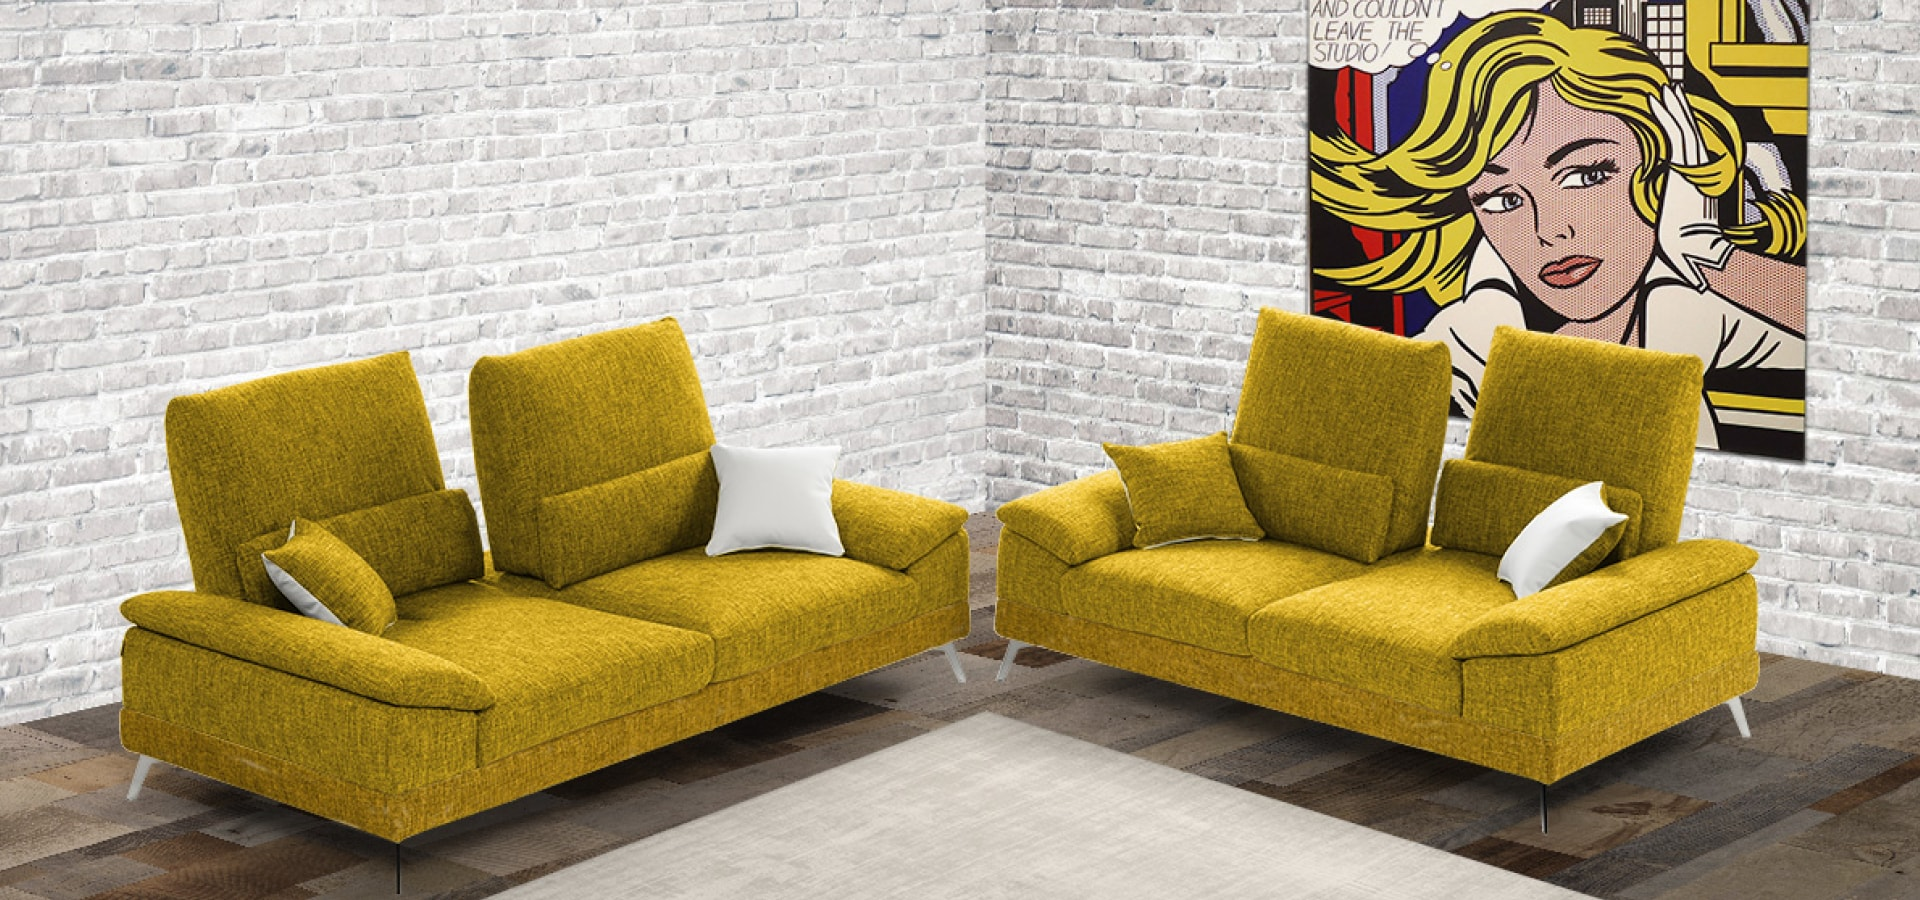 Canapé Chianti 1